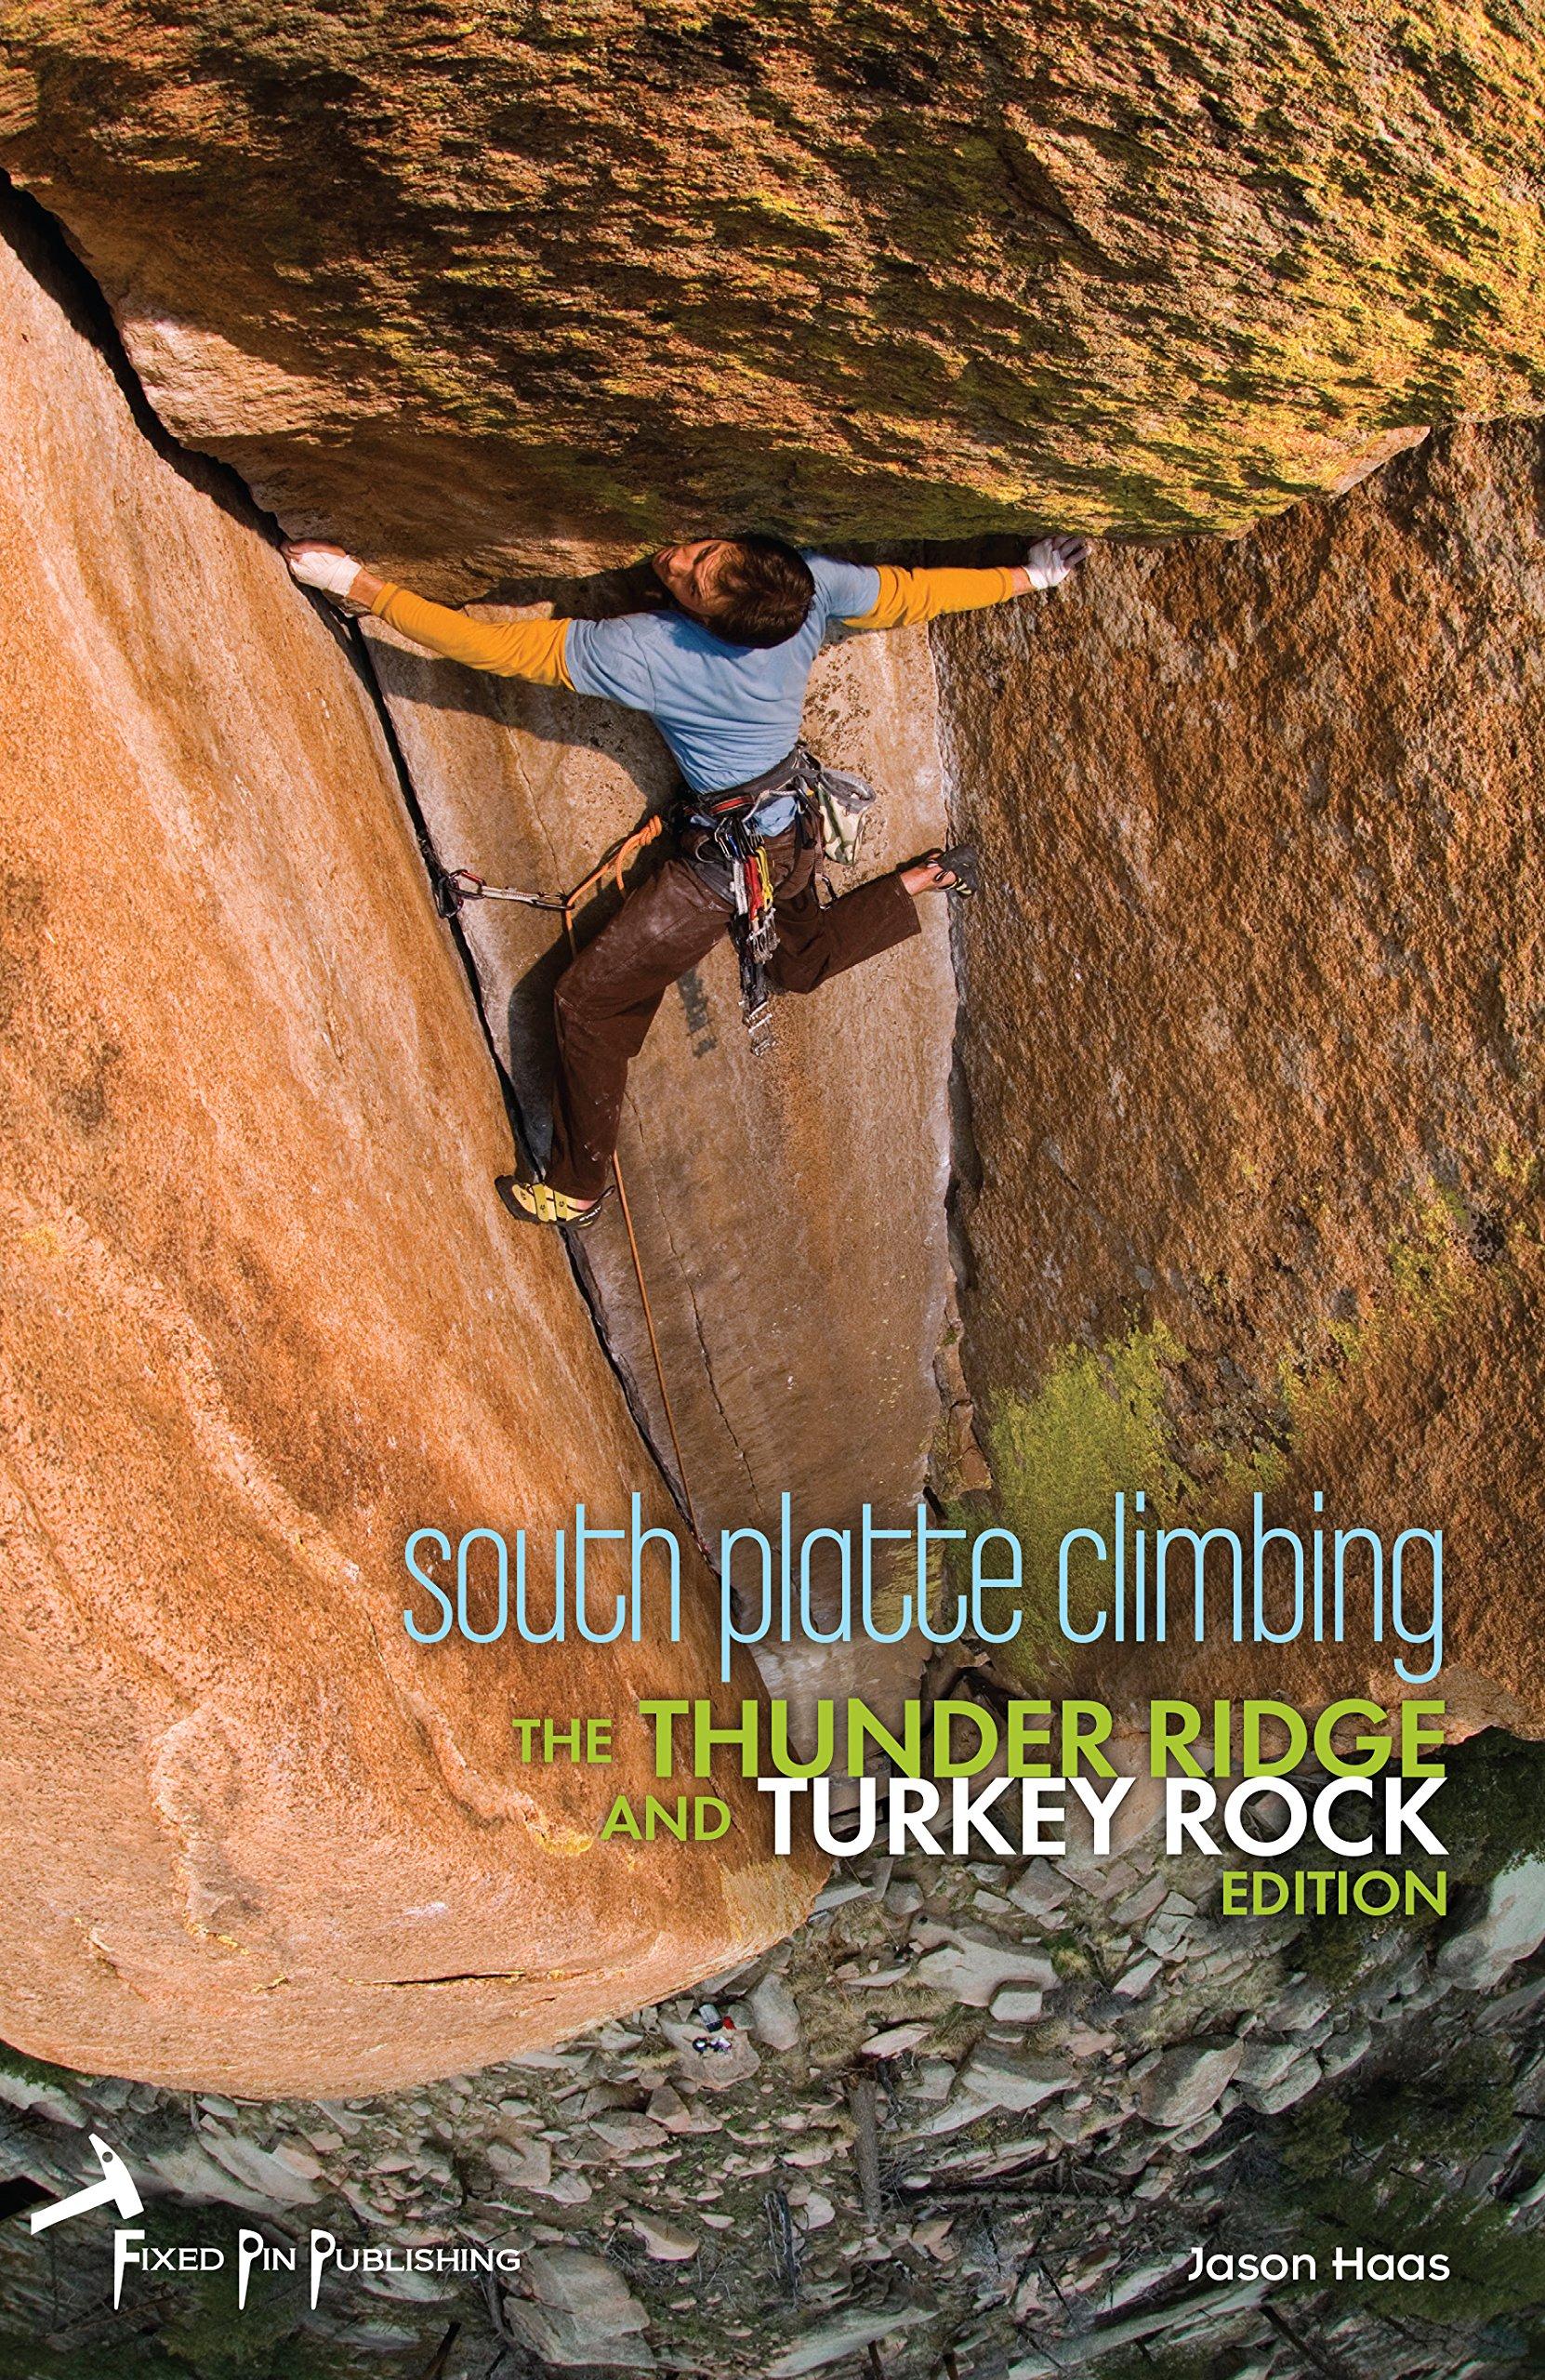 Hwl Platte south platte climbing the thunder ridge and turkey rock edition